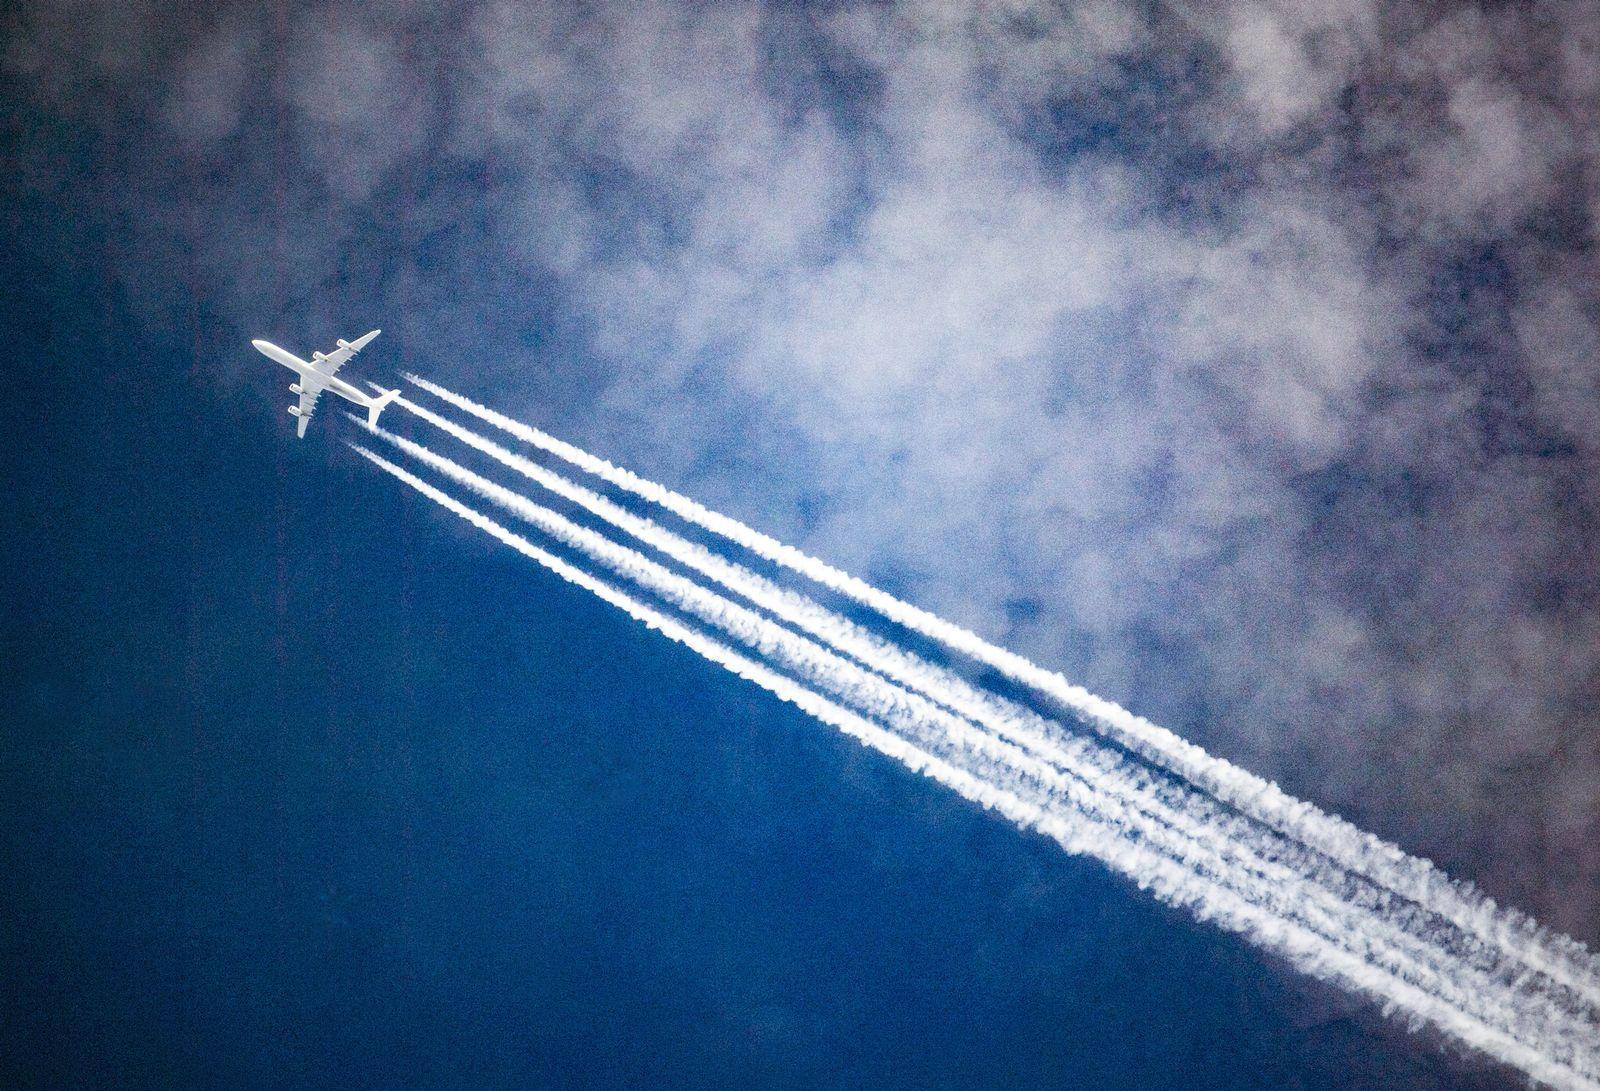 Flugreise trotz Klimastreik